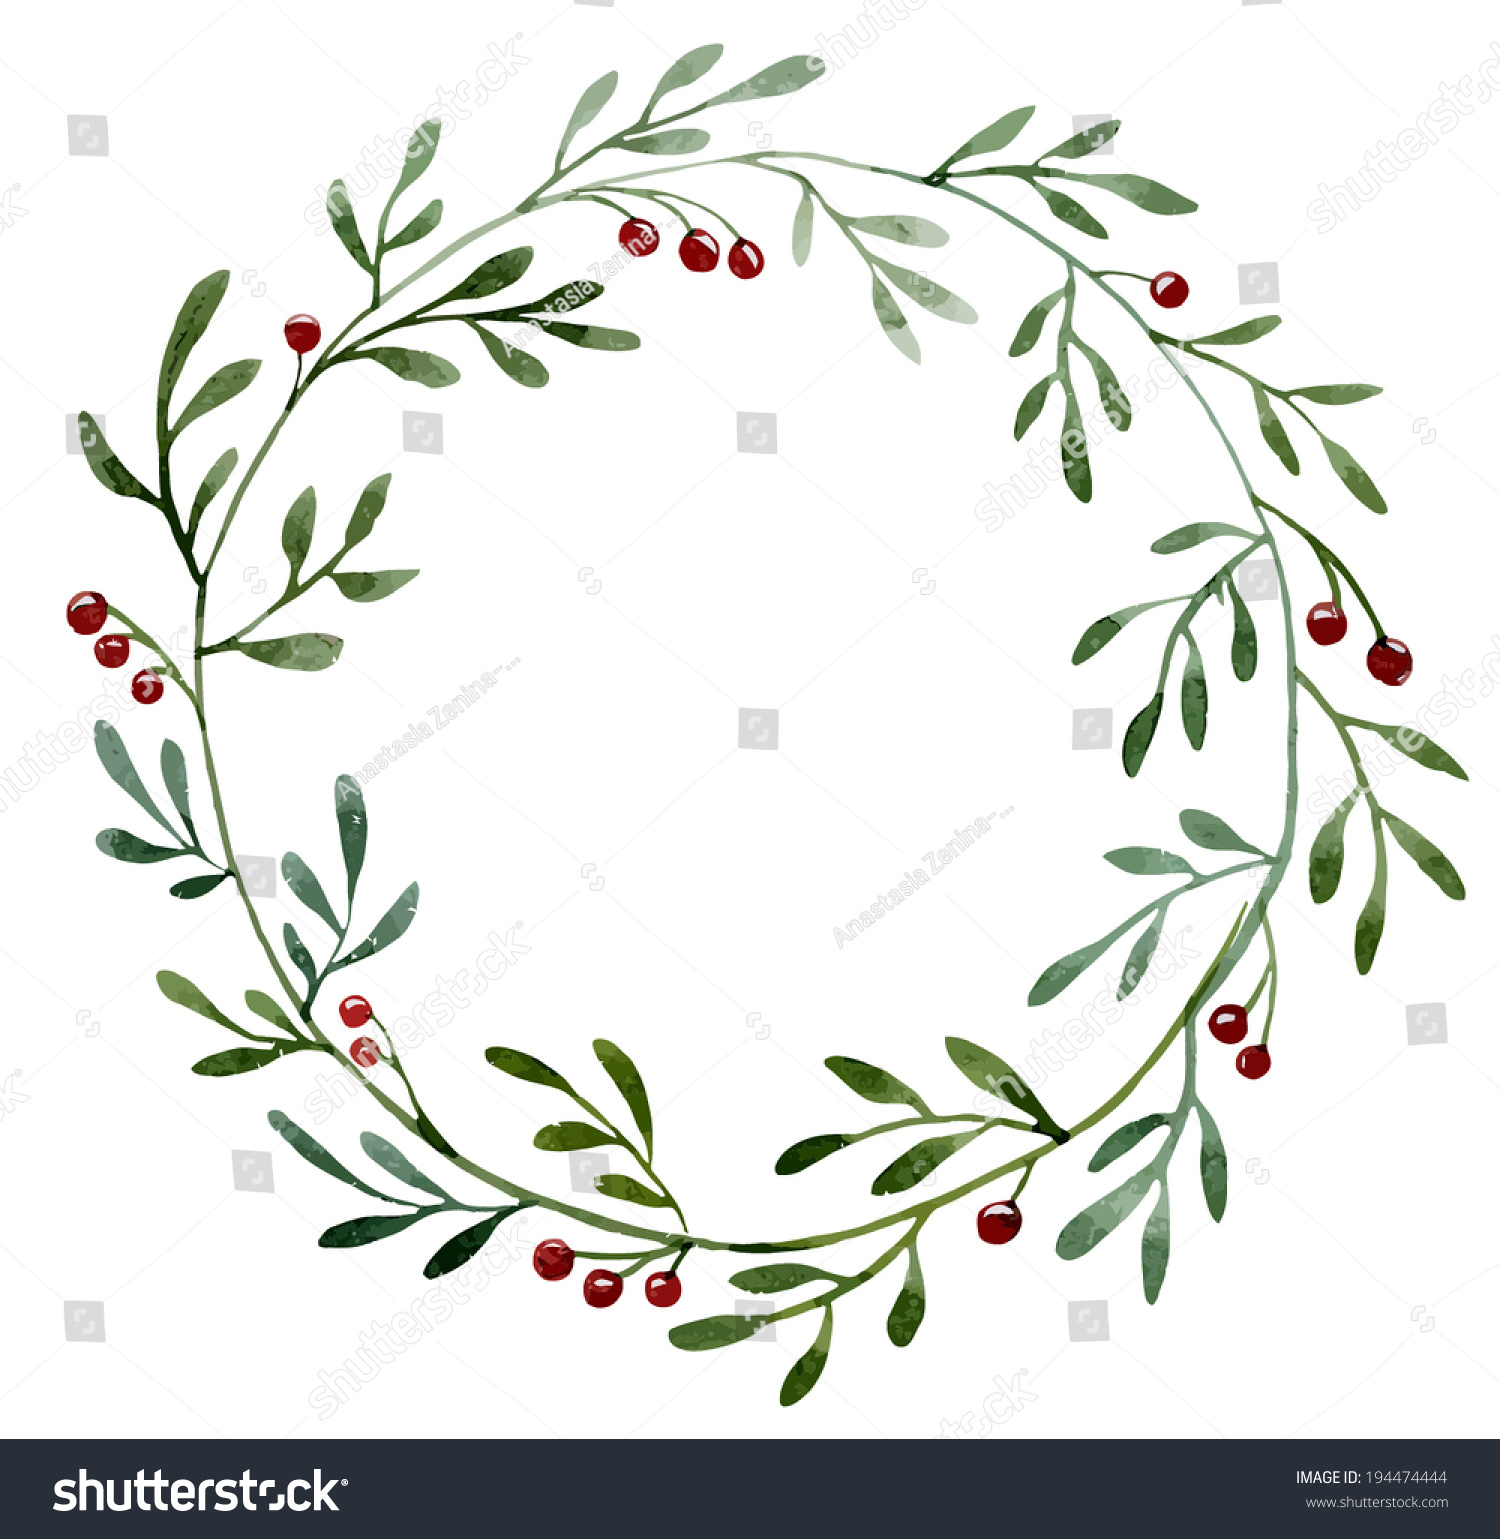 6278 Wreath free clipart.